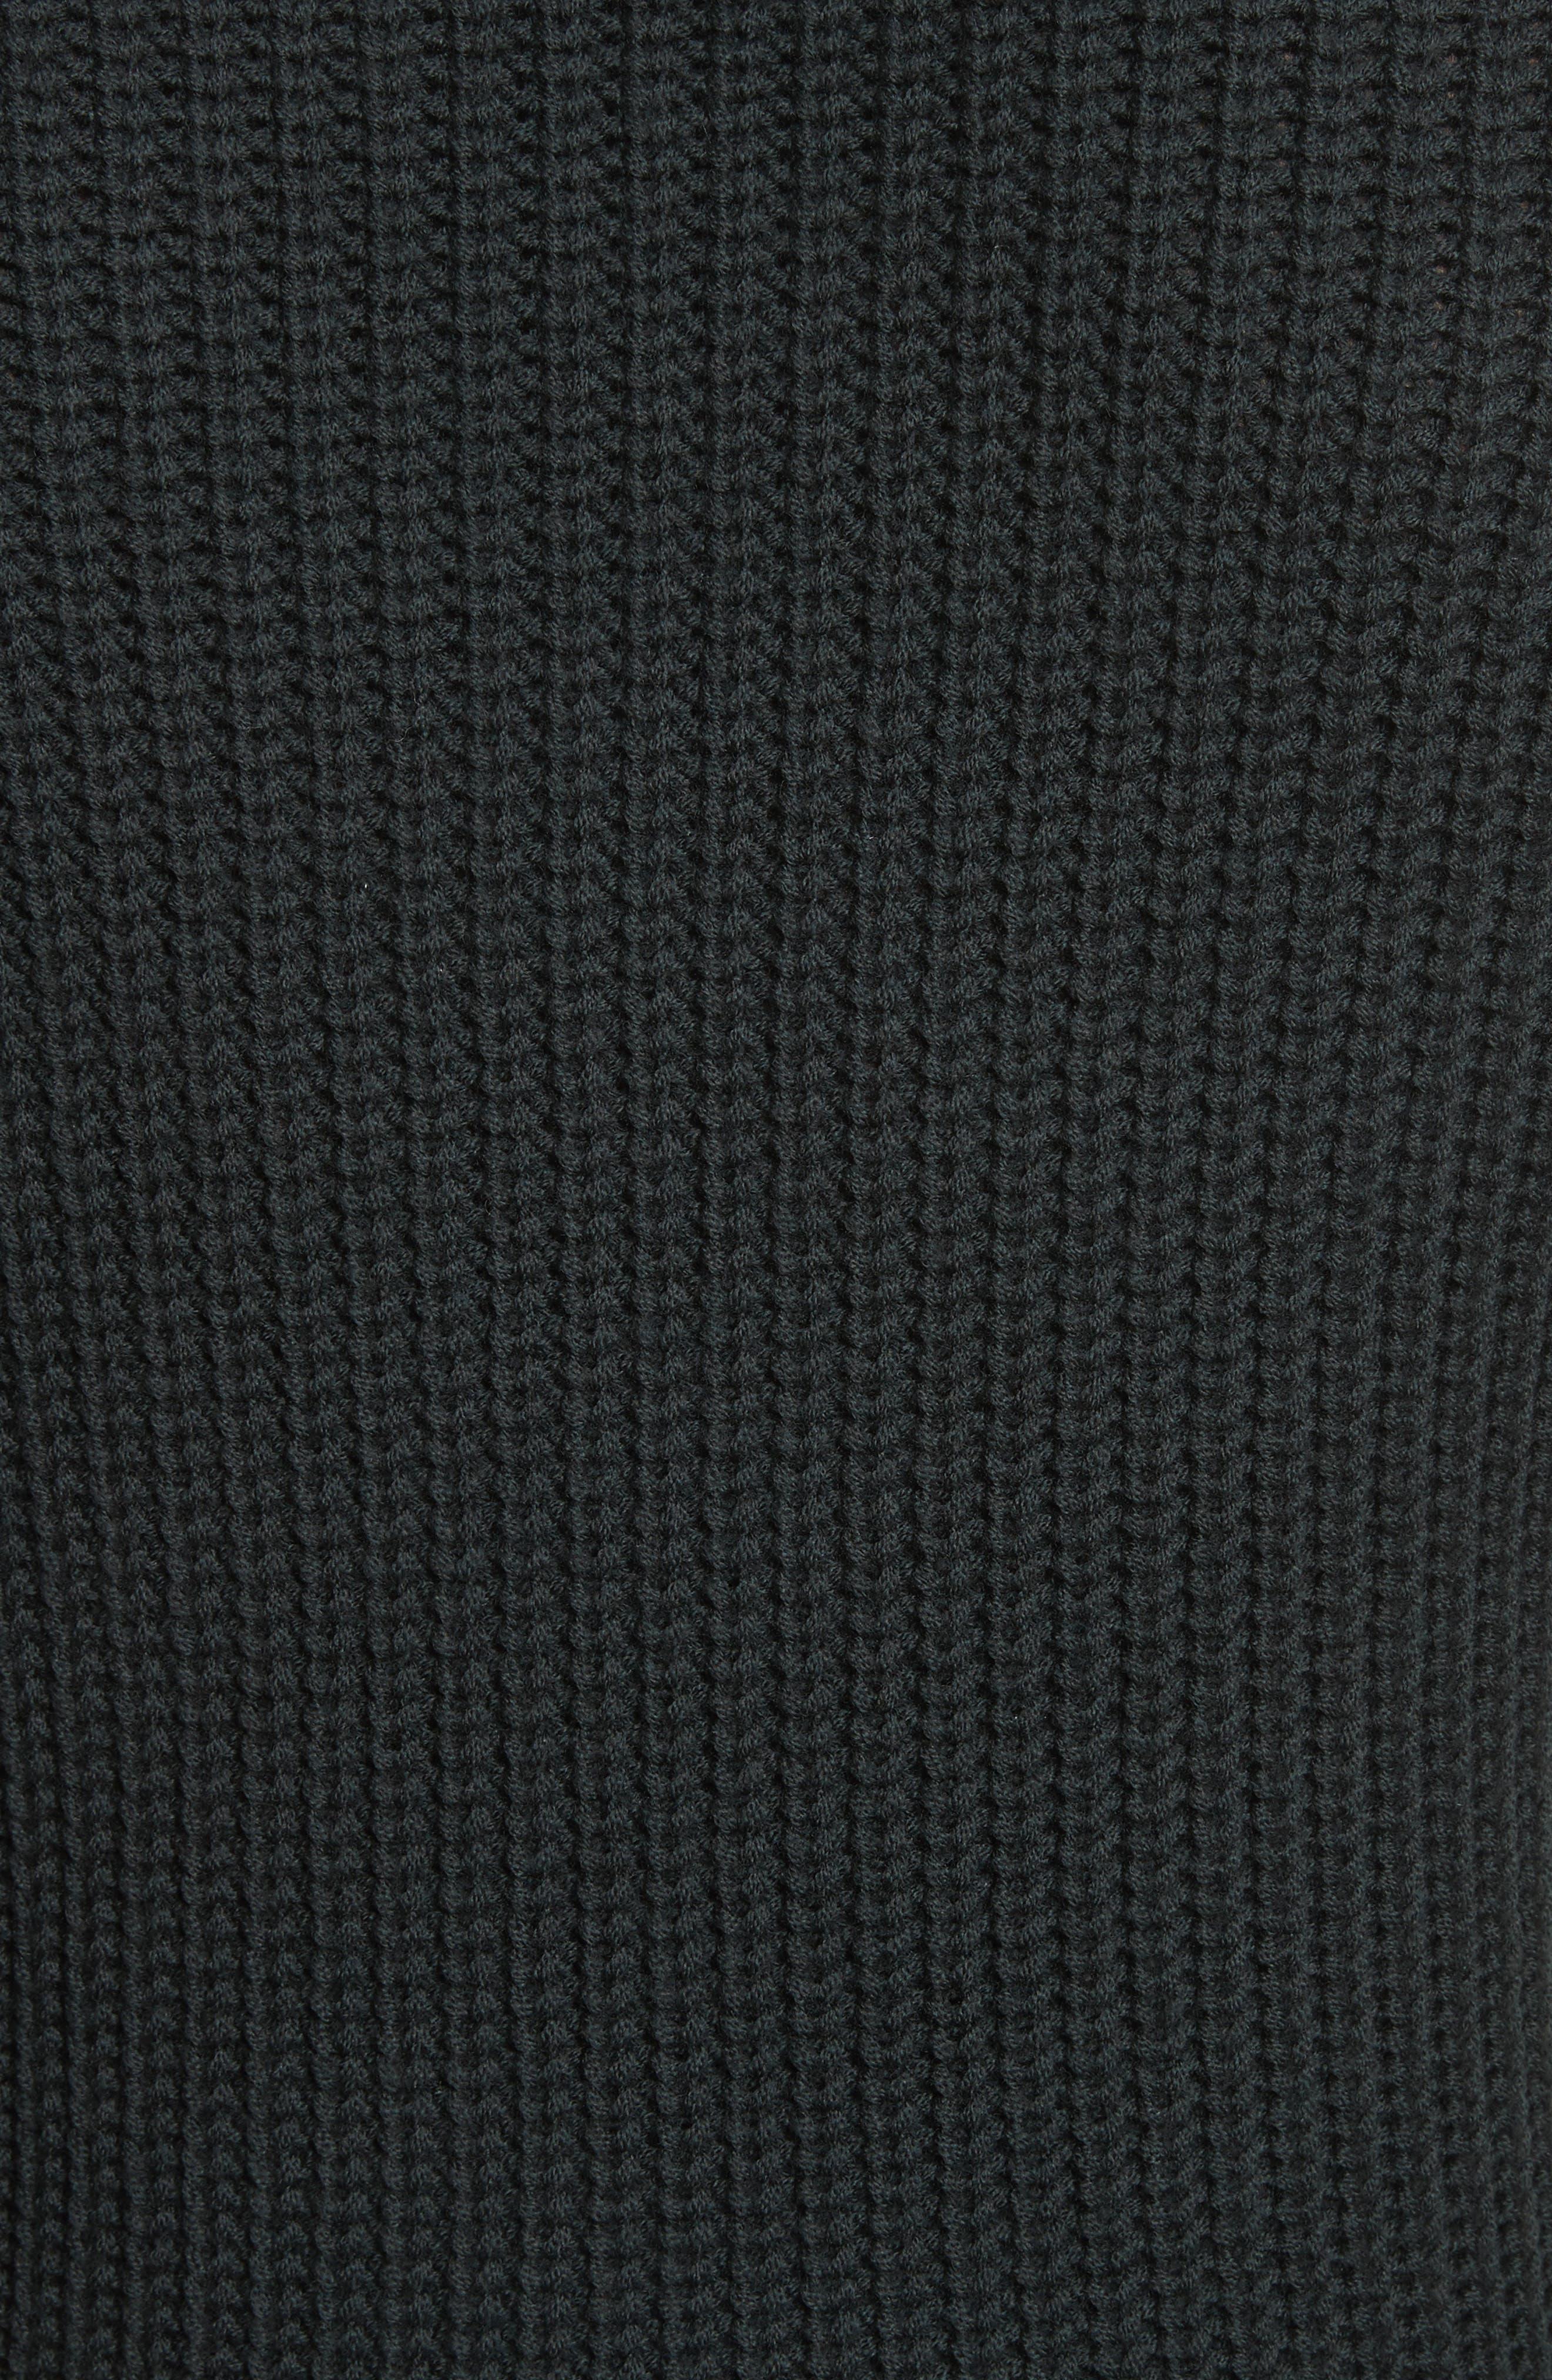 Pull Berger Merino Wool Sweater,                             Alternate thumbnail 5, color,                             300